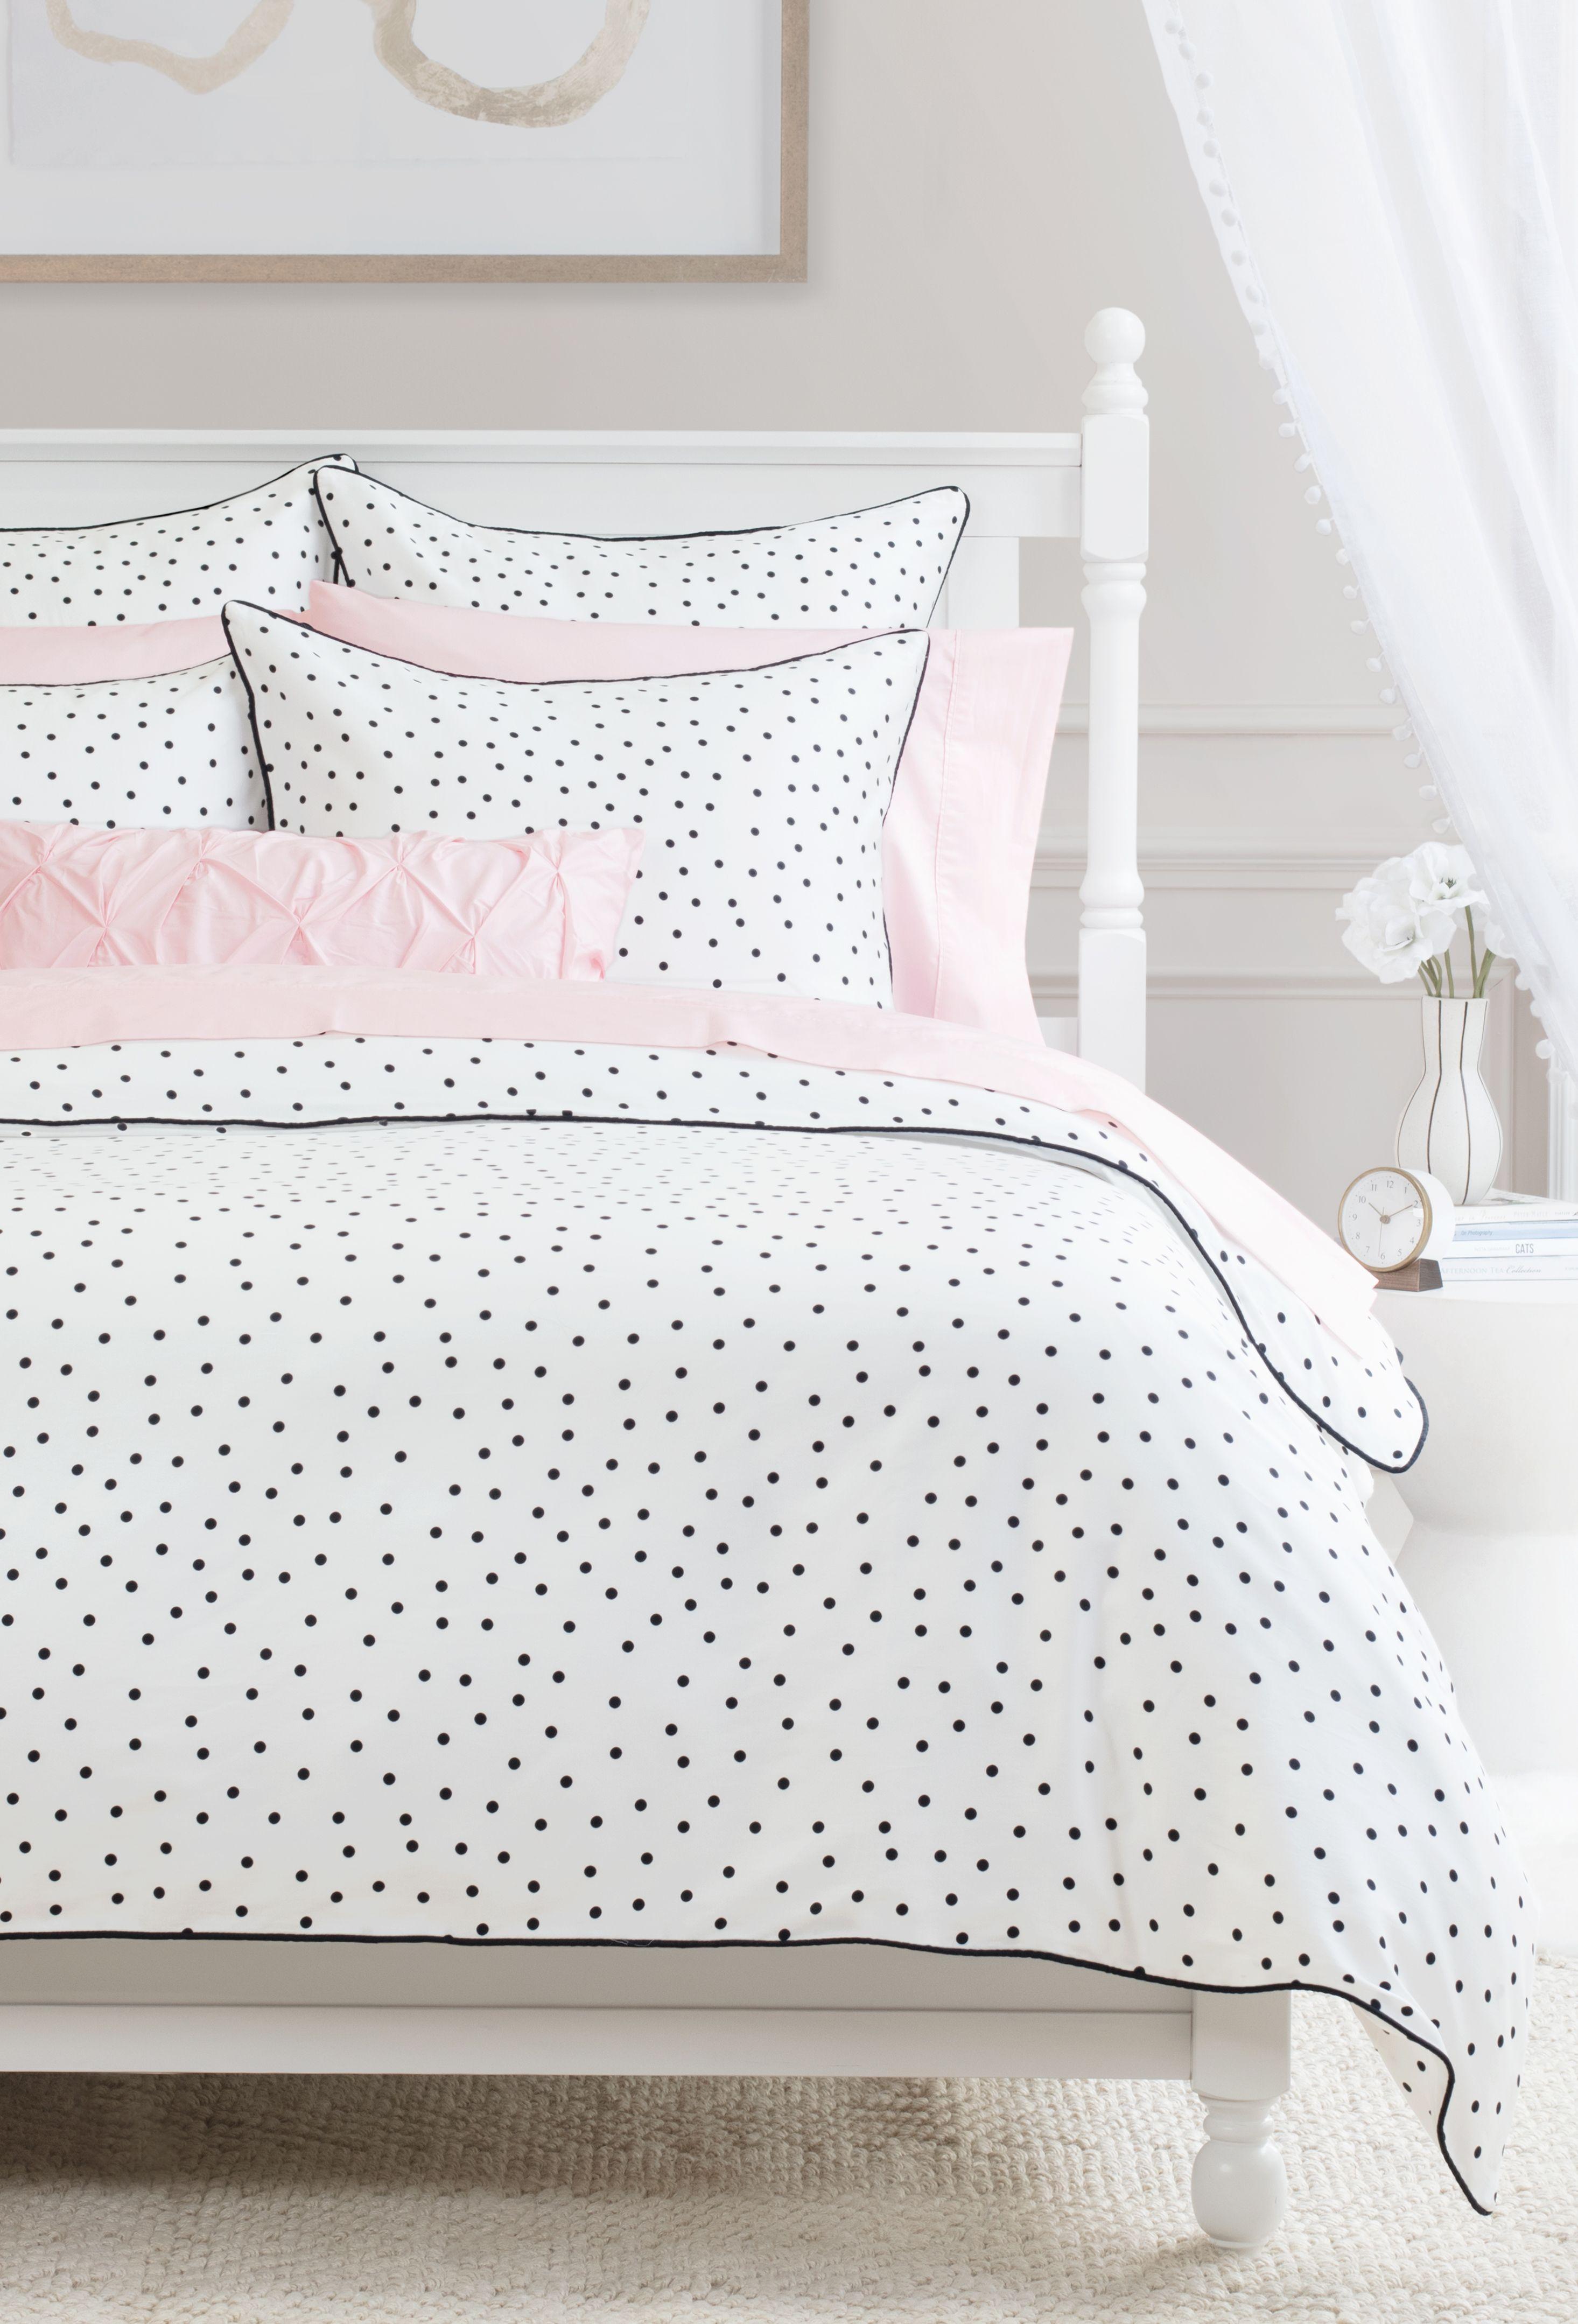 Our Harper Polka Dot Bedding Complete With Whimsical Black Dots Adds Playful Sophistication To Polka Dot Bedroom Quality Duvet Covers Bedding Master Bedroom